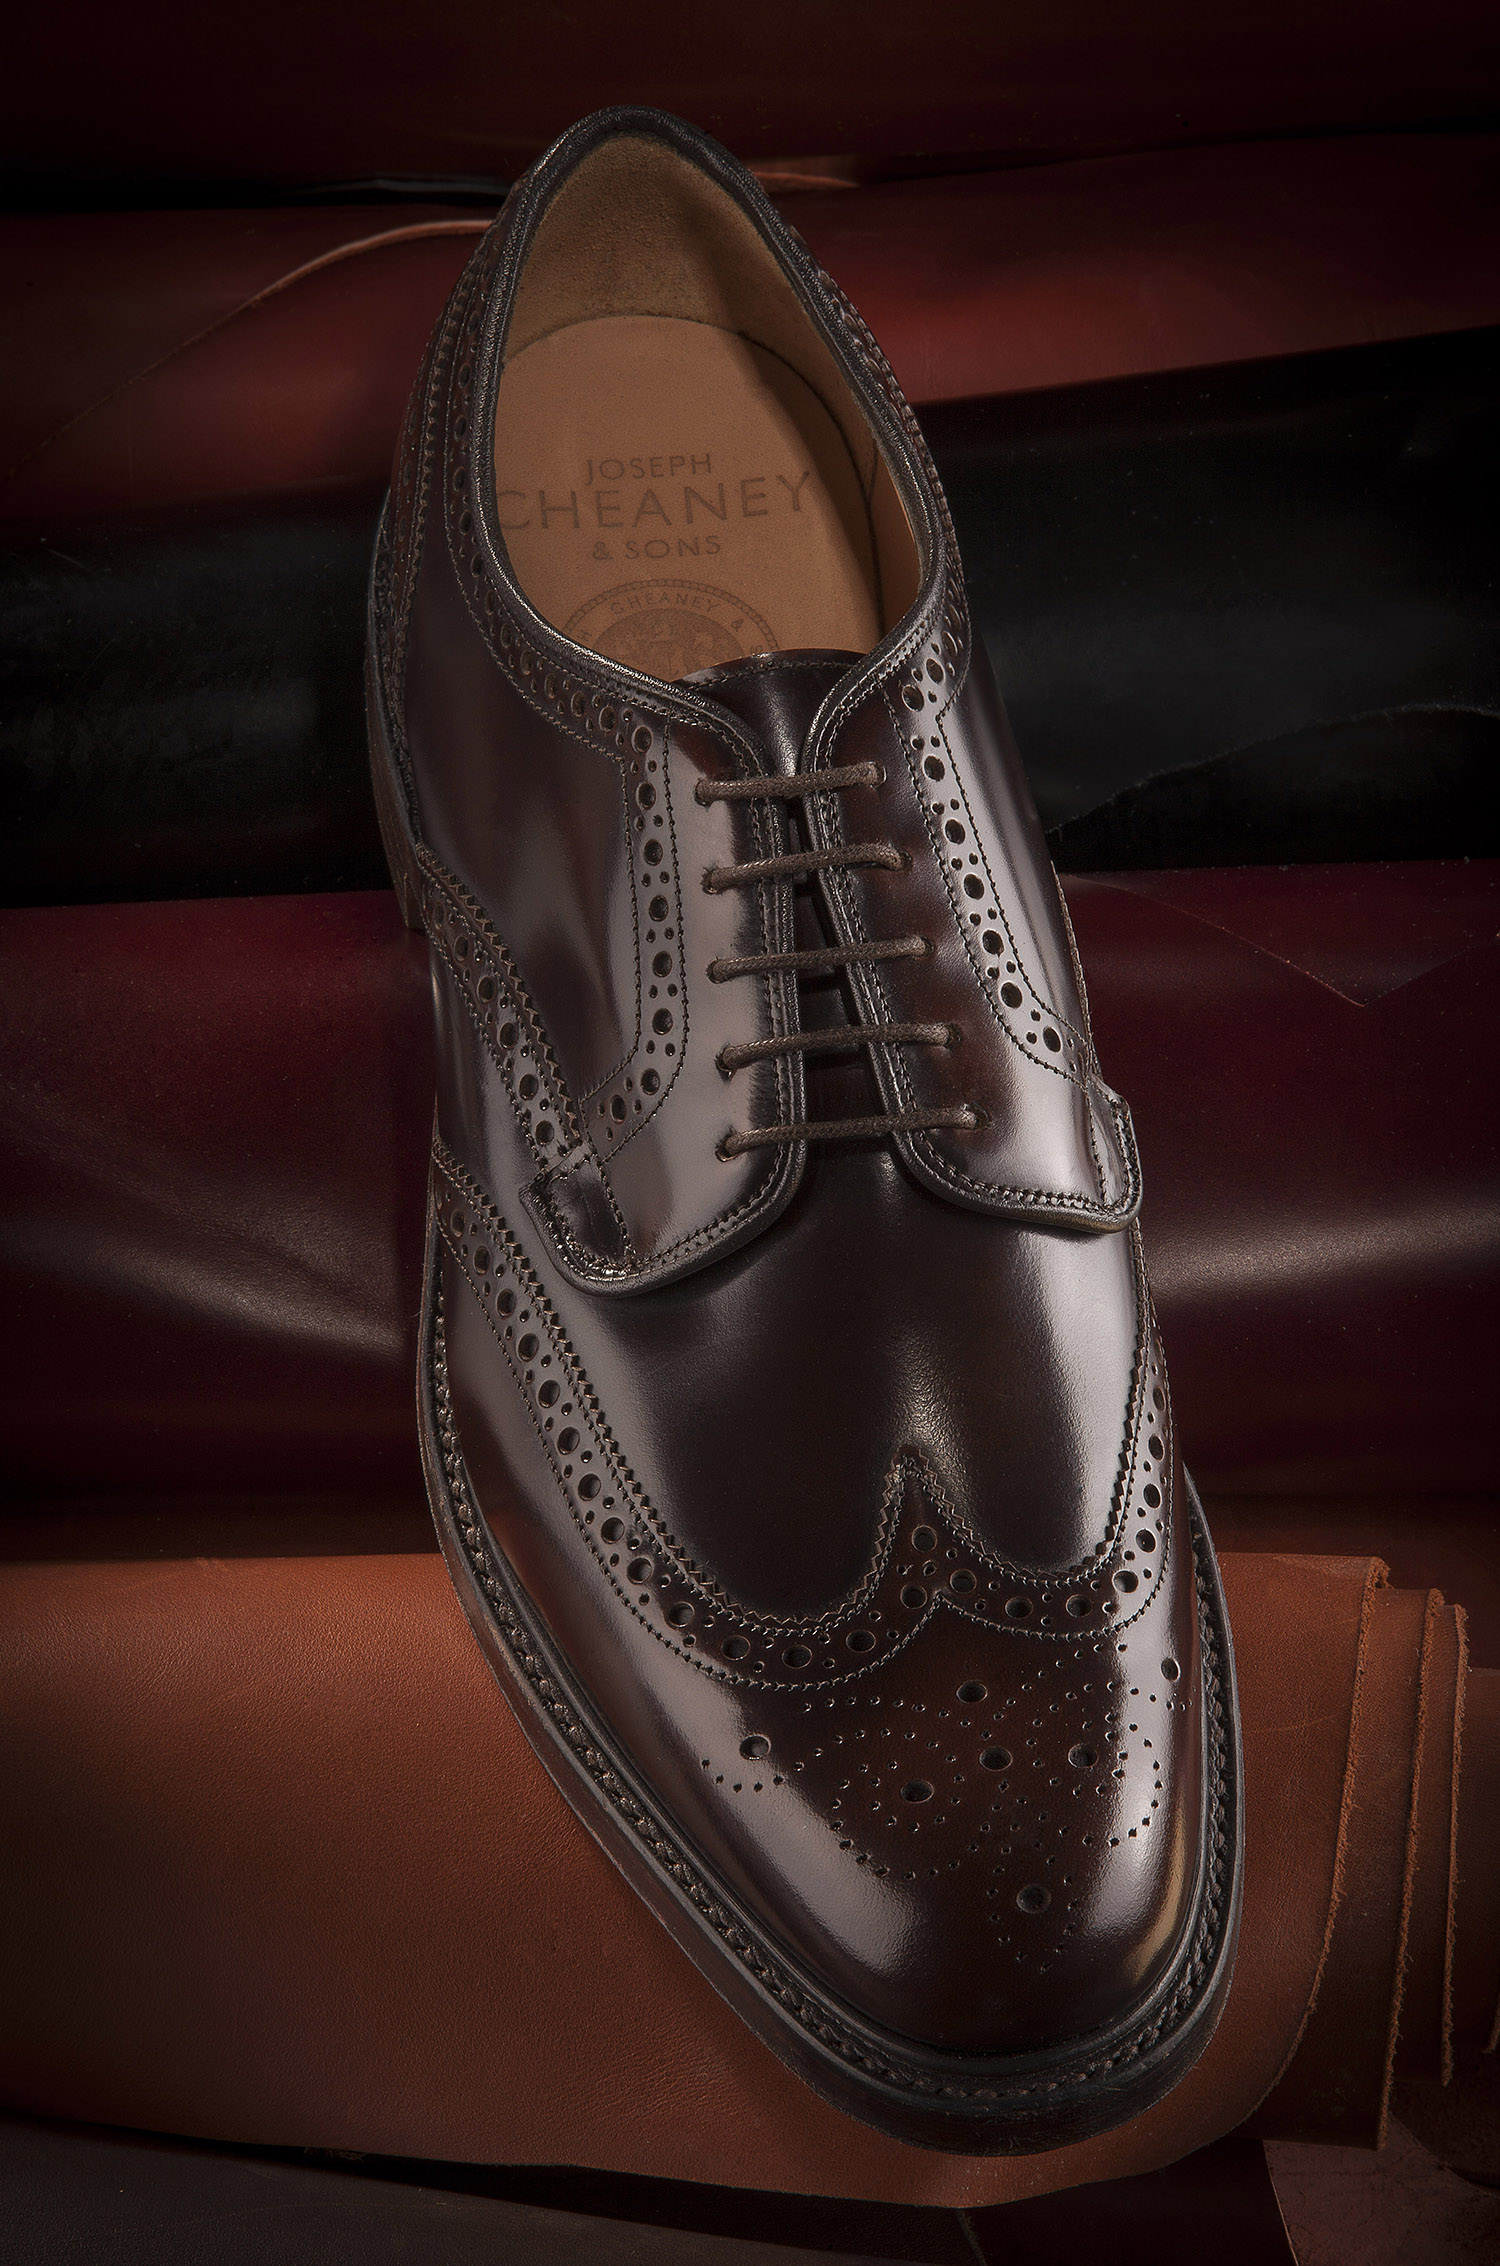 Shoes_002LR.jpg